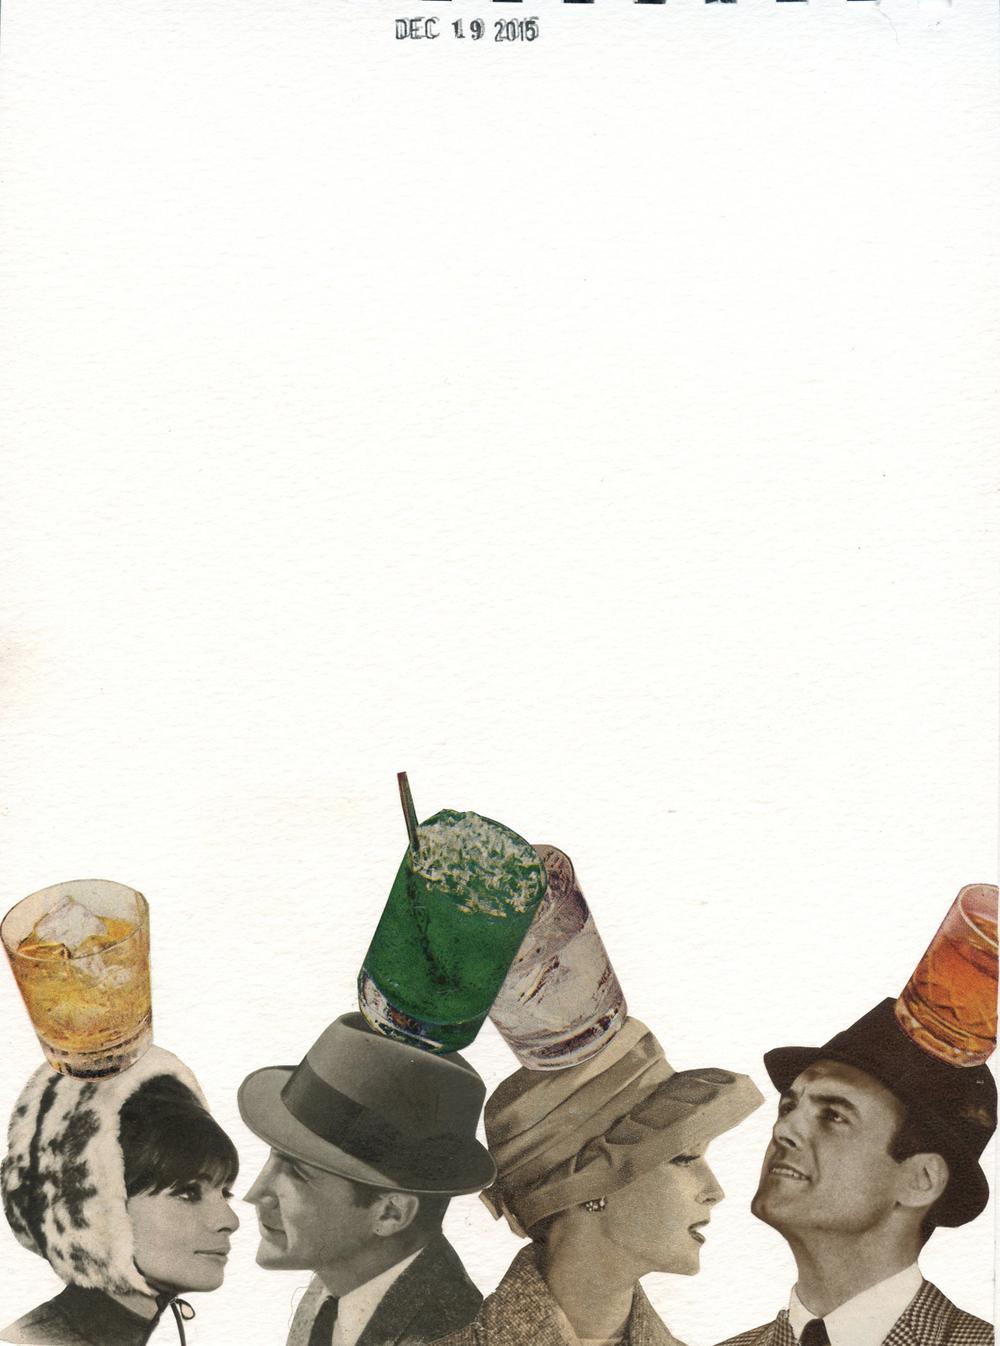 Hats & Highballs (77)